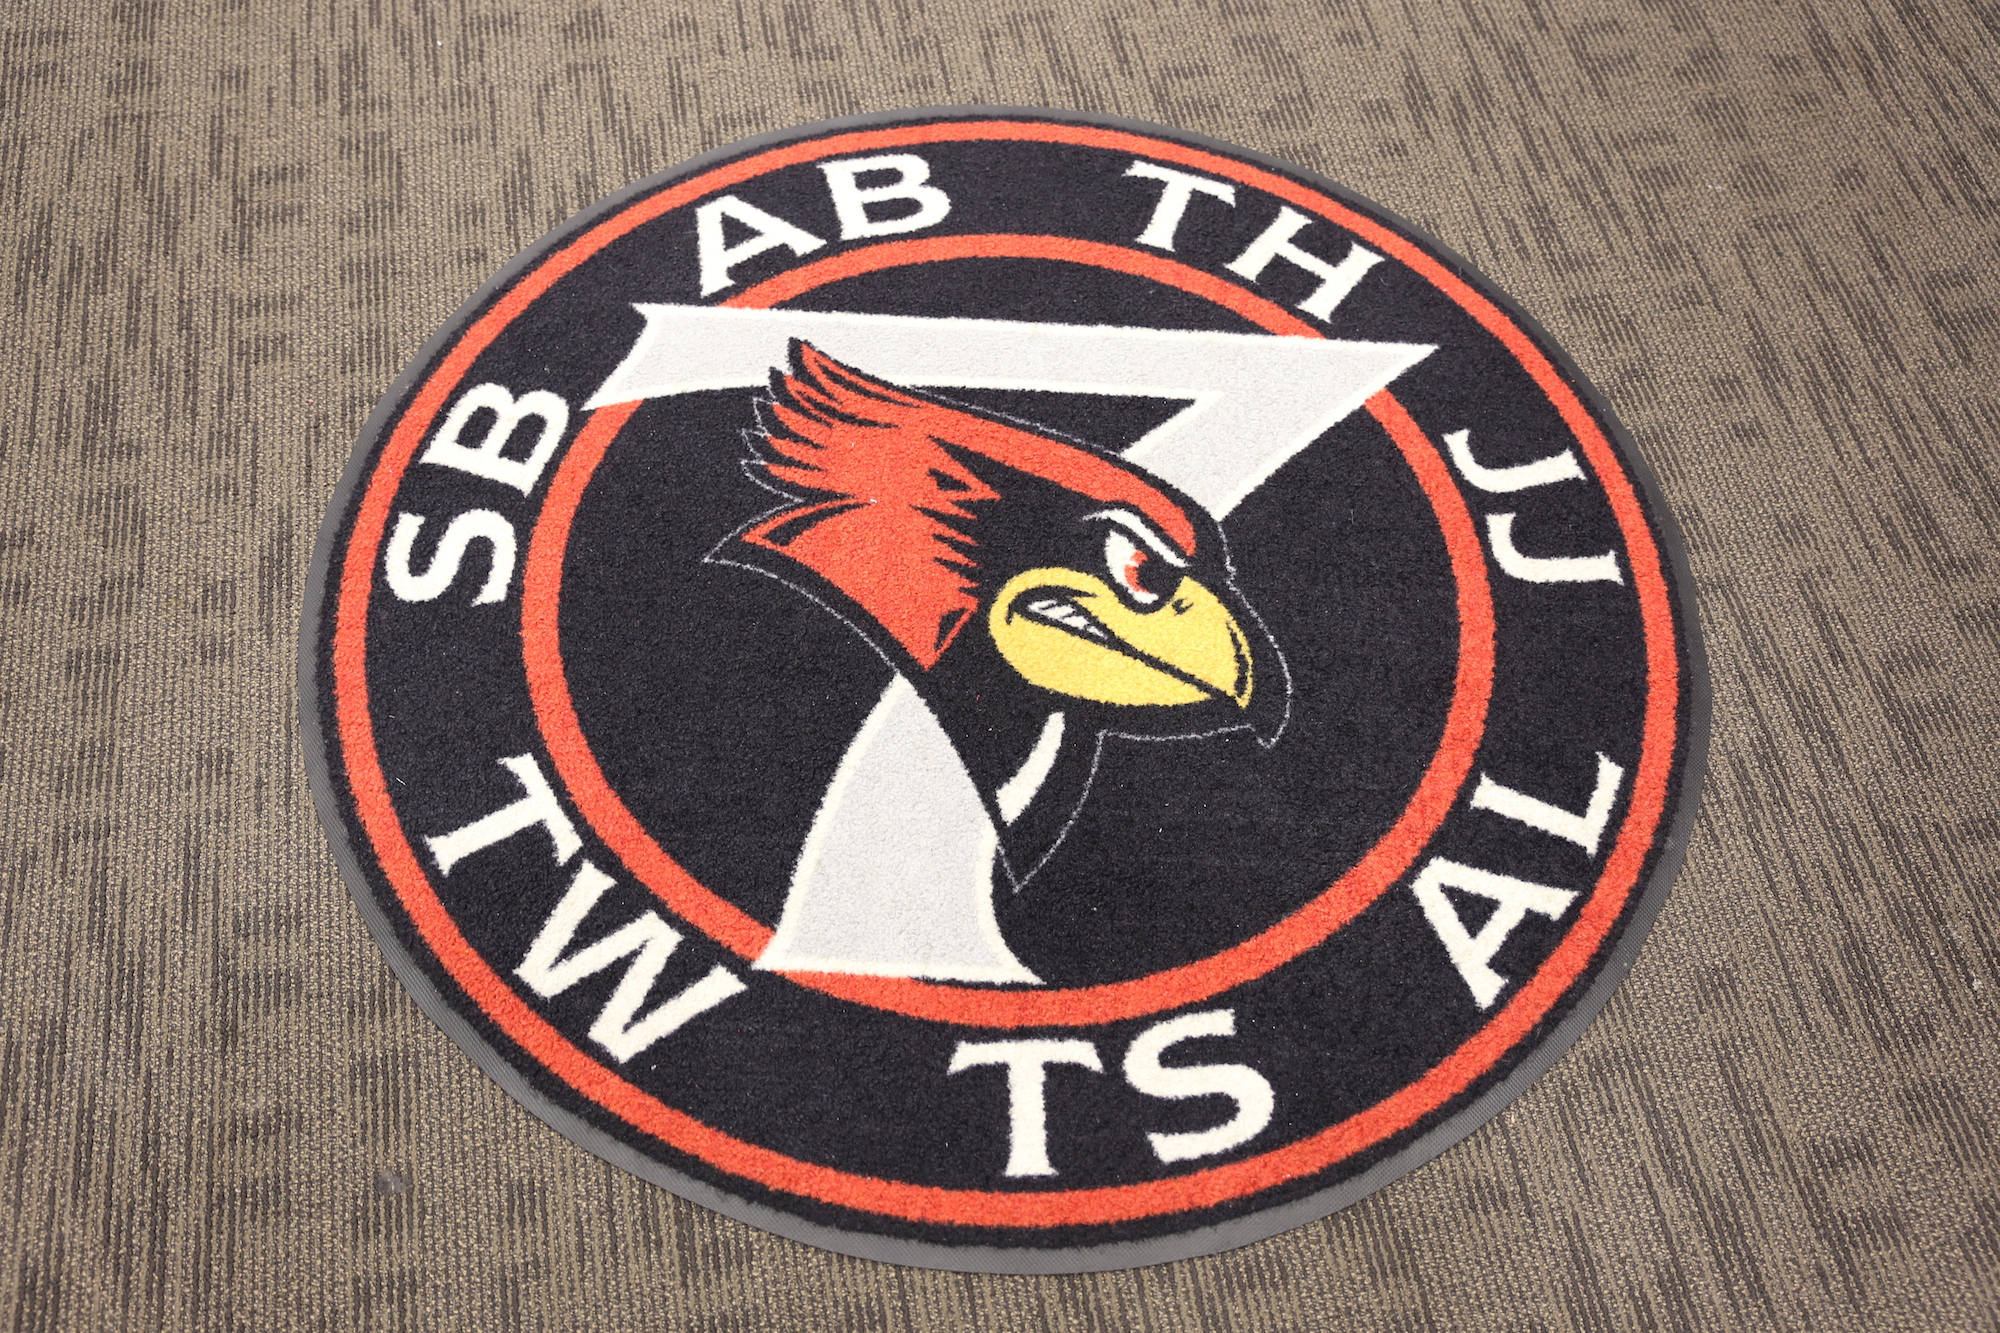 The Redbird 7 logo in Illinois State's locker room.